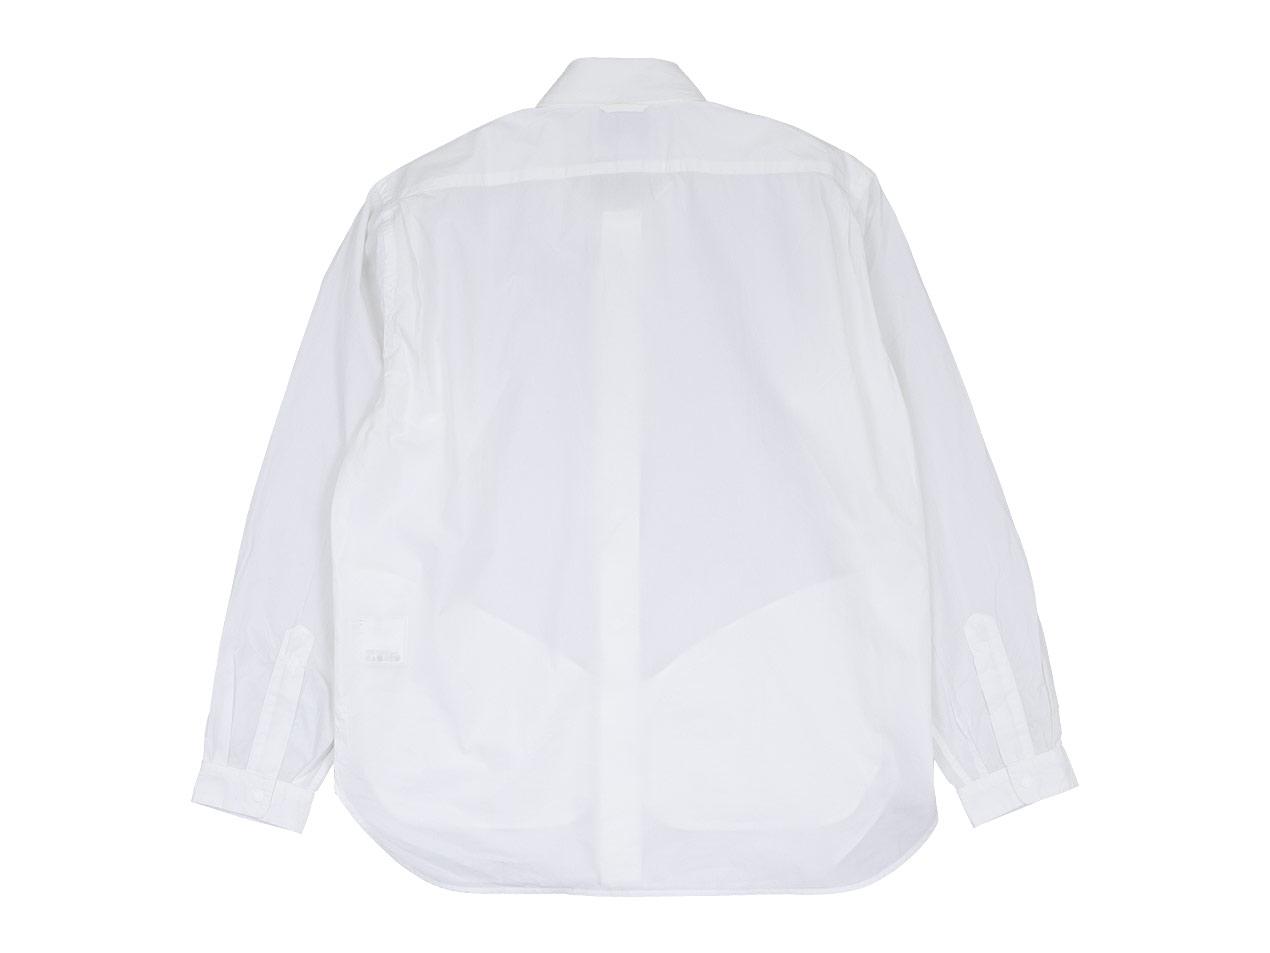 YAECA コンフォートシャツ リラックス ロング